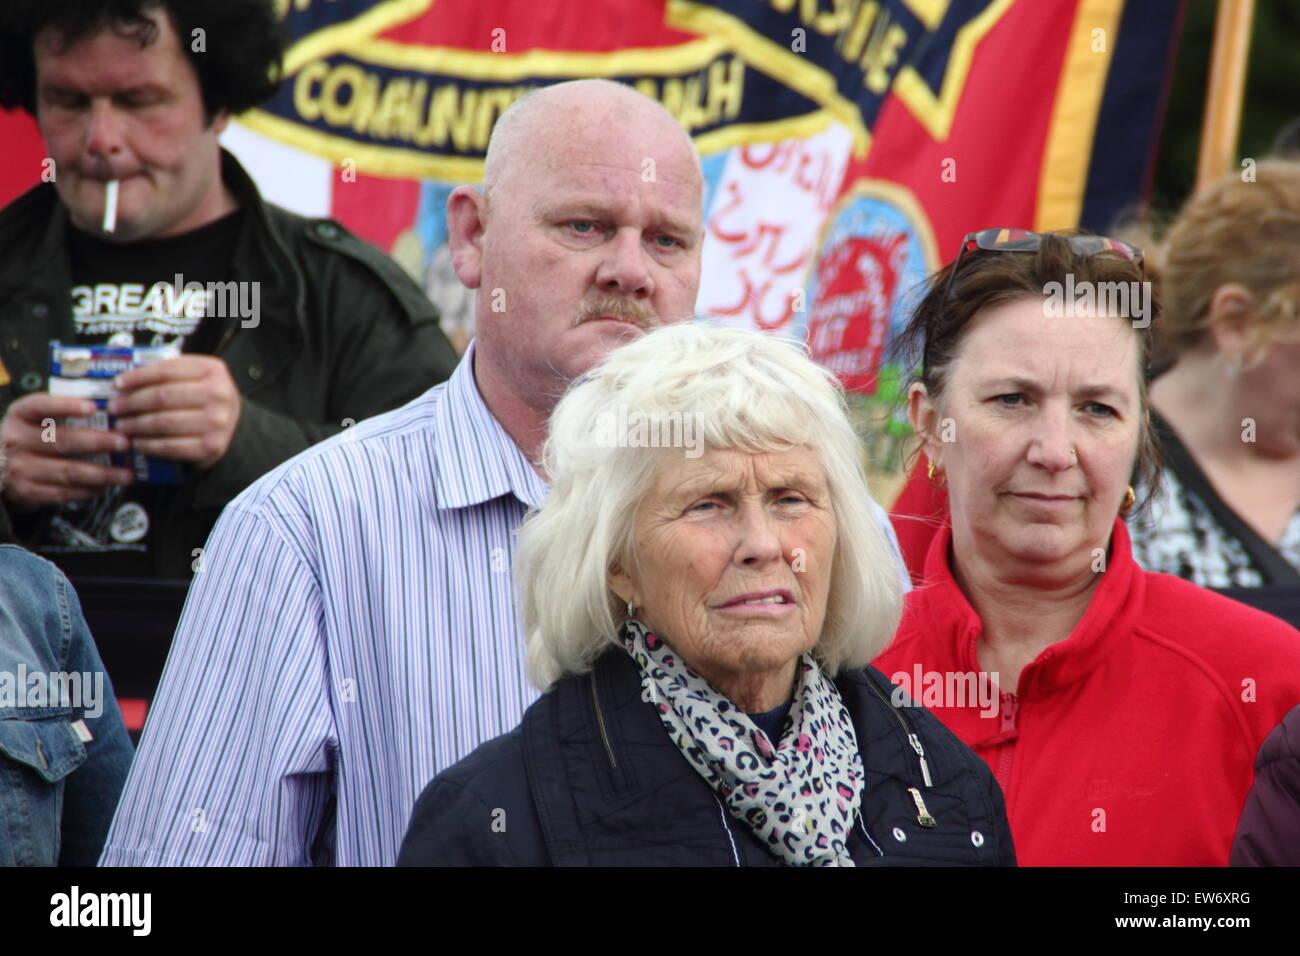 Orgreave, South Yorkshire, UK. 18. Juni 2015. Anne Scargill (Mitte vorne), ehemalige Ehefrau des Miners' Strike Stockfoto